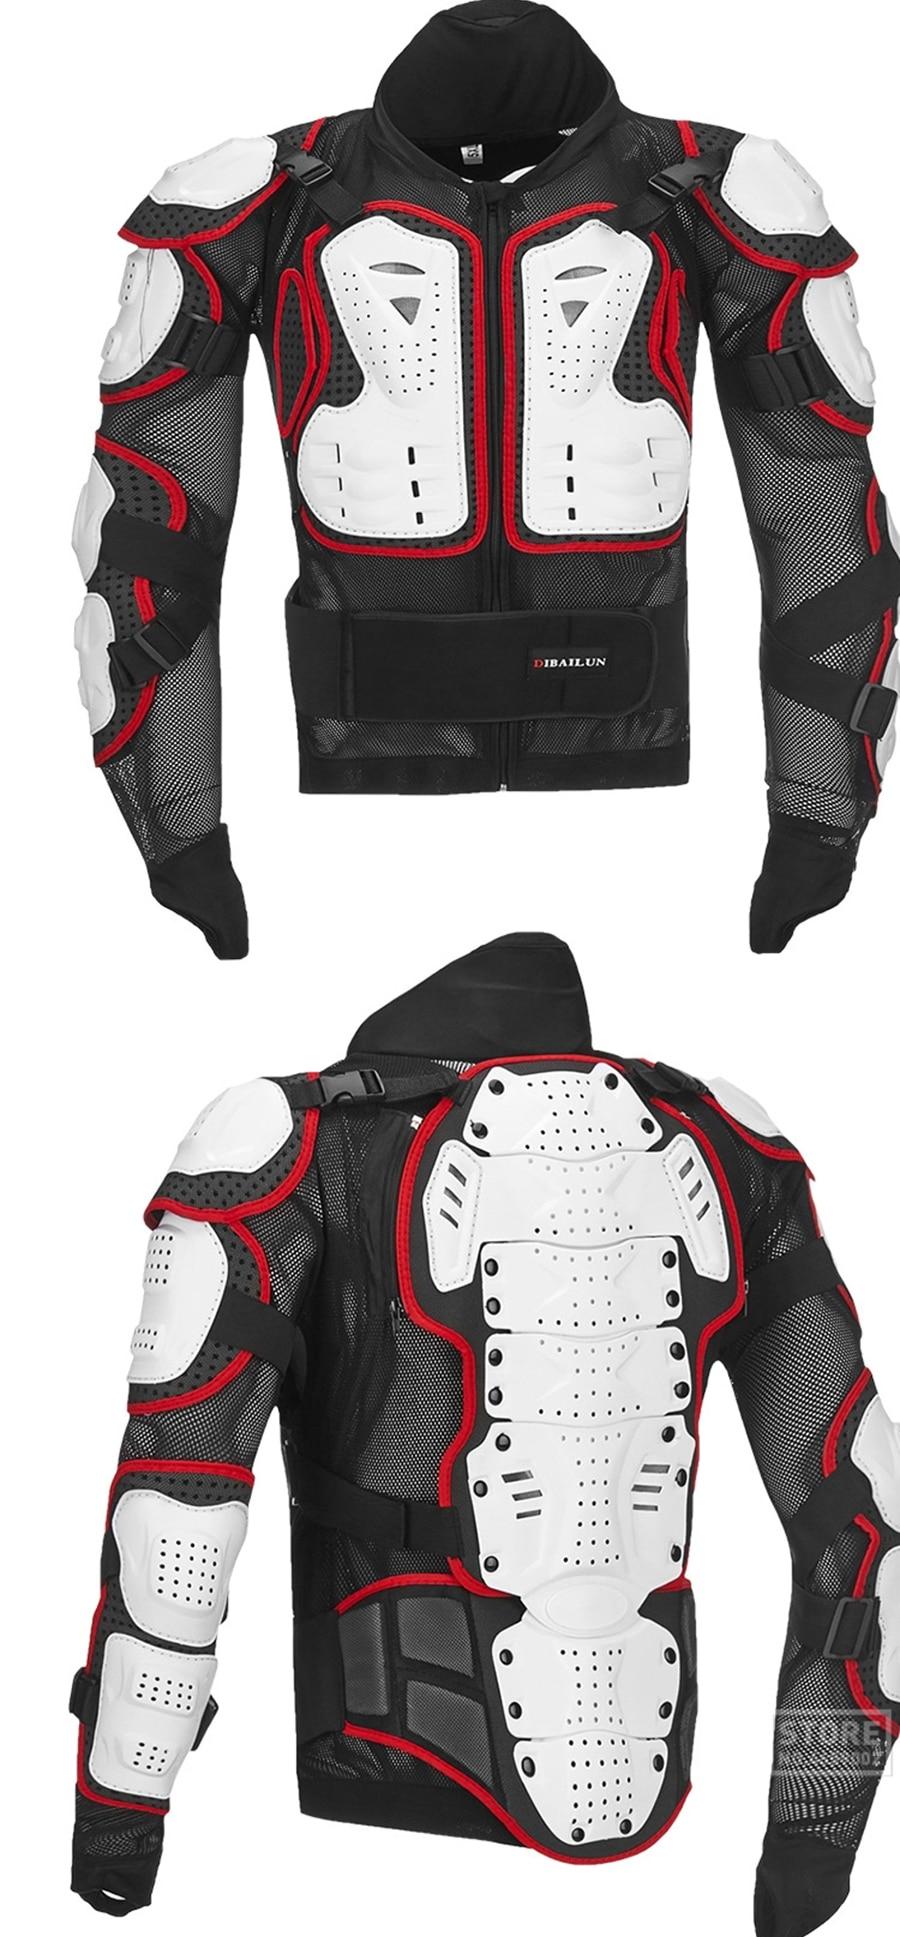 HEROBIKER-Motociclo-Del-Rivestimento-di-Motocross_10